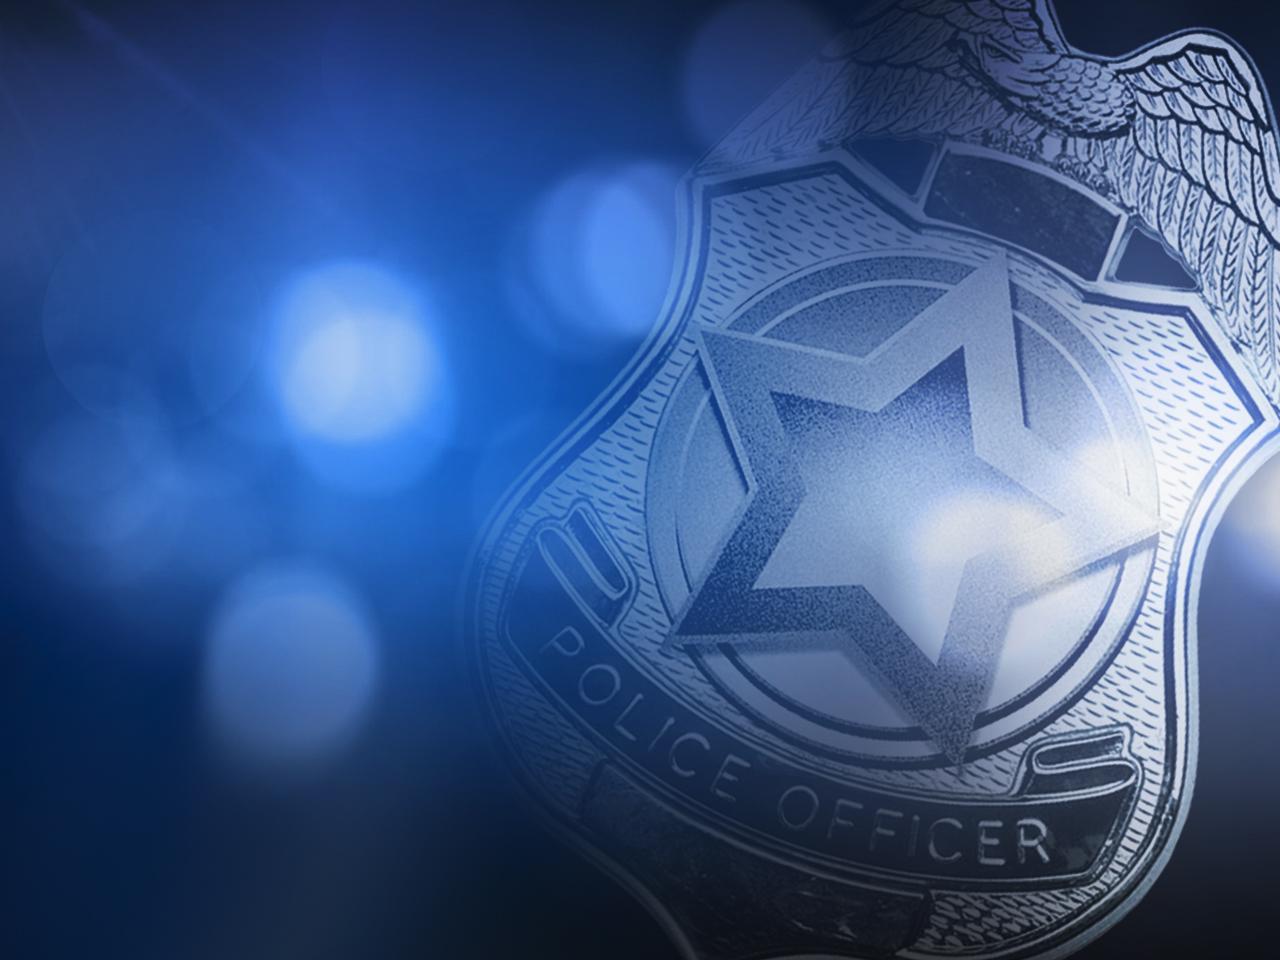 police badgee_1530217091742.jpg.jpg